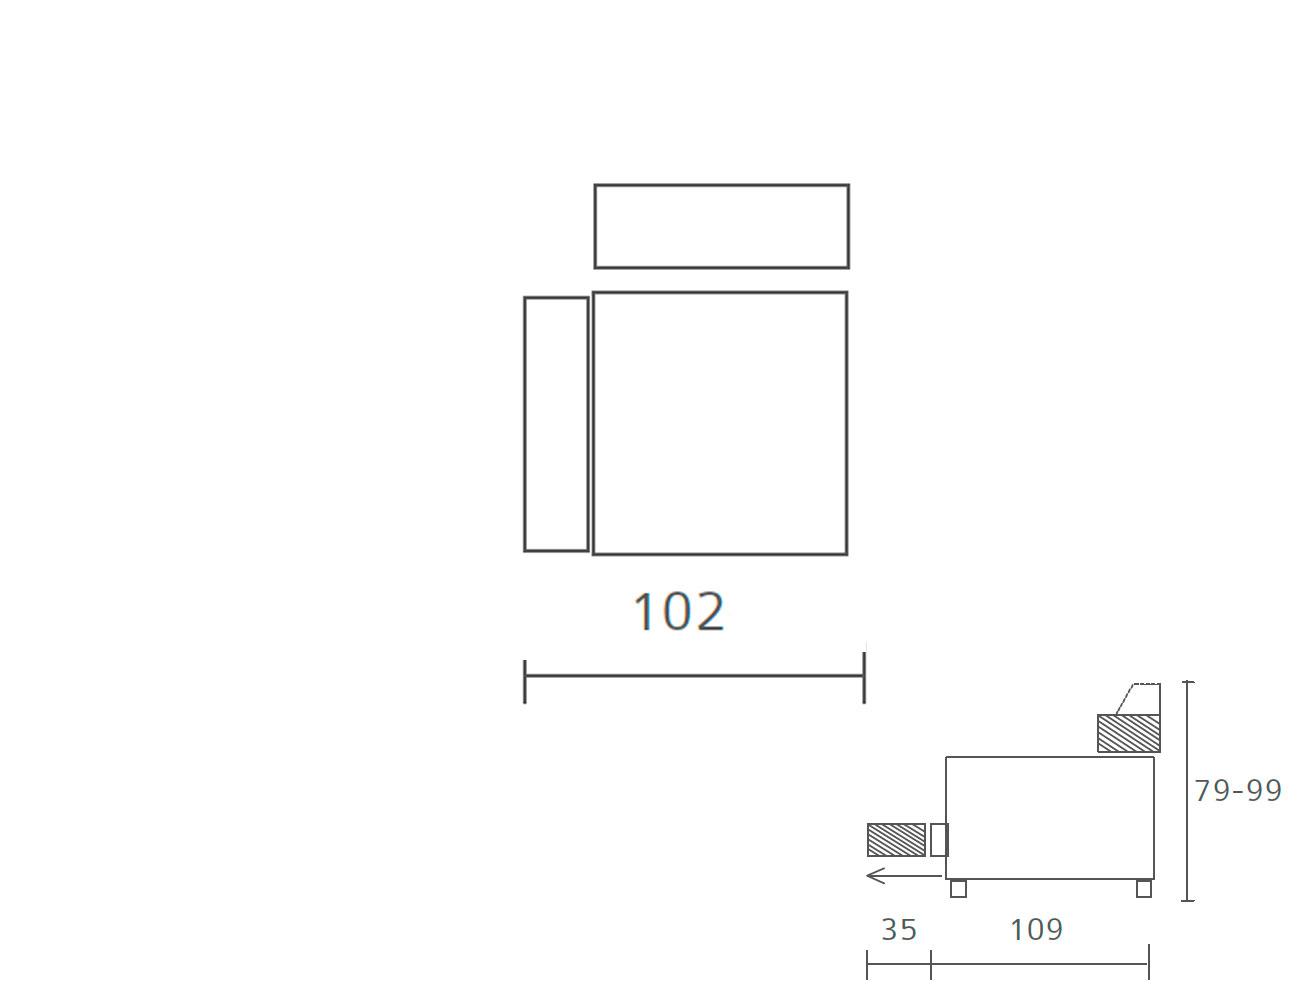 Sofa piel 1 plaza 102